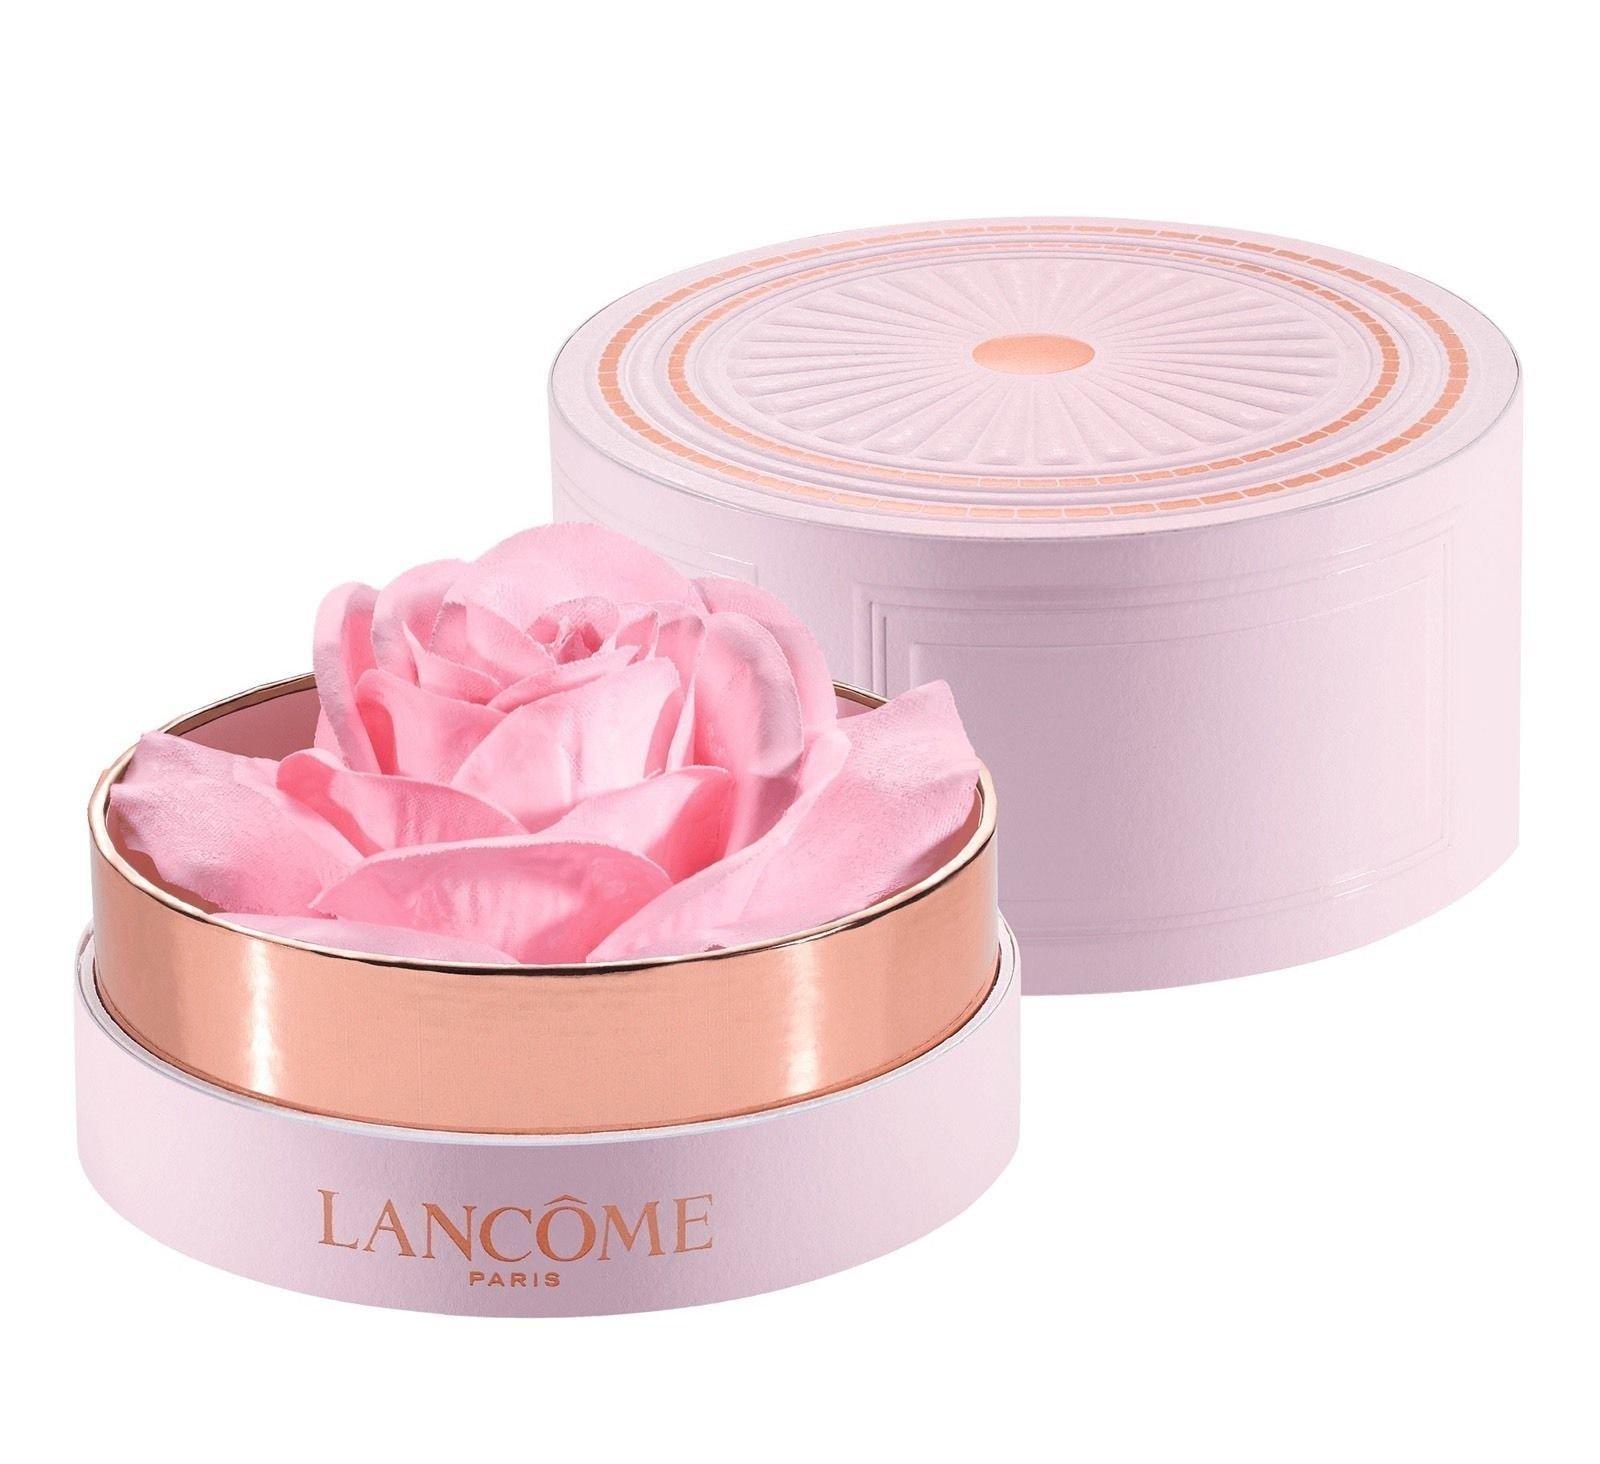 Lan'Come LA ROSE BLUSH POUDRER HIGHLIGHTING POWDER Limited Edition